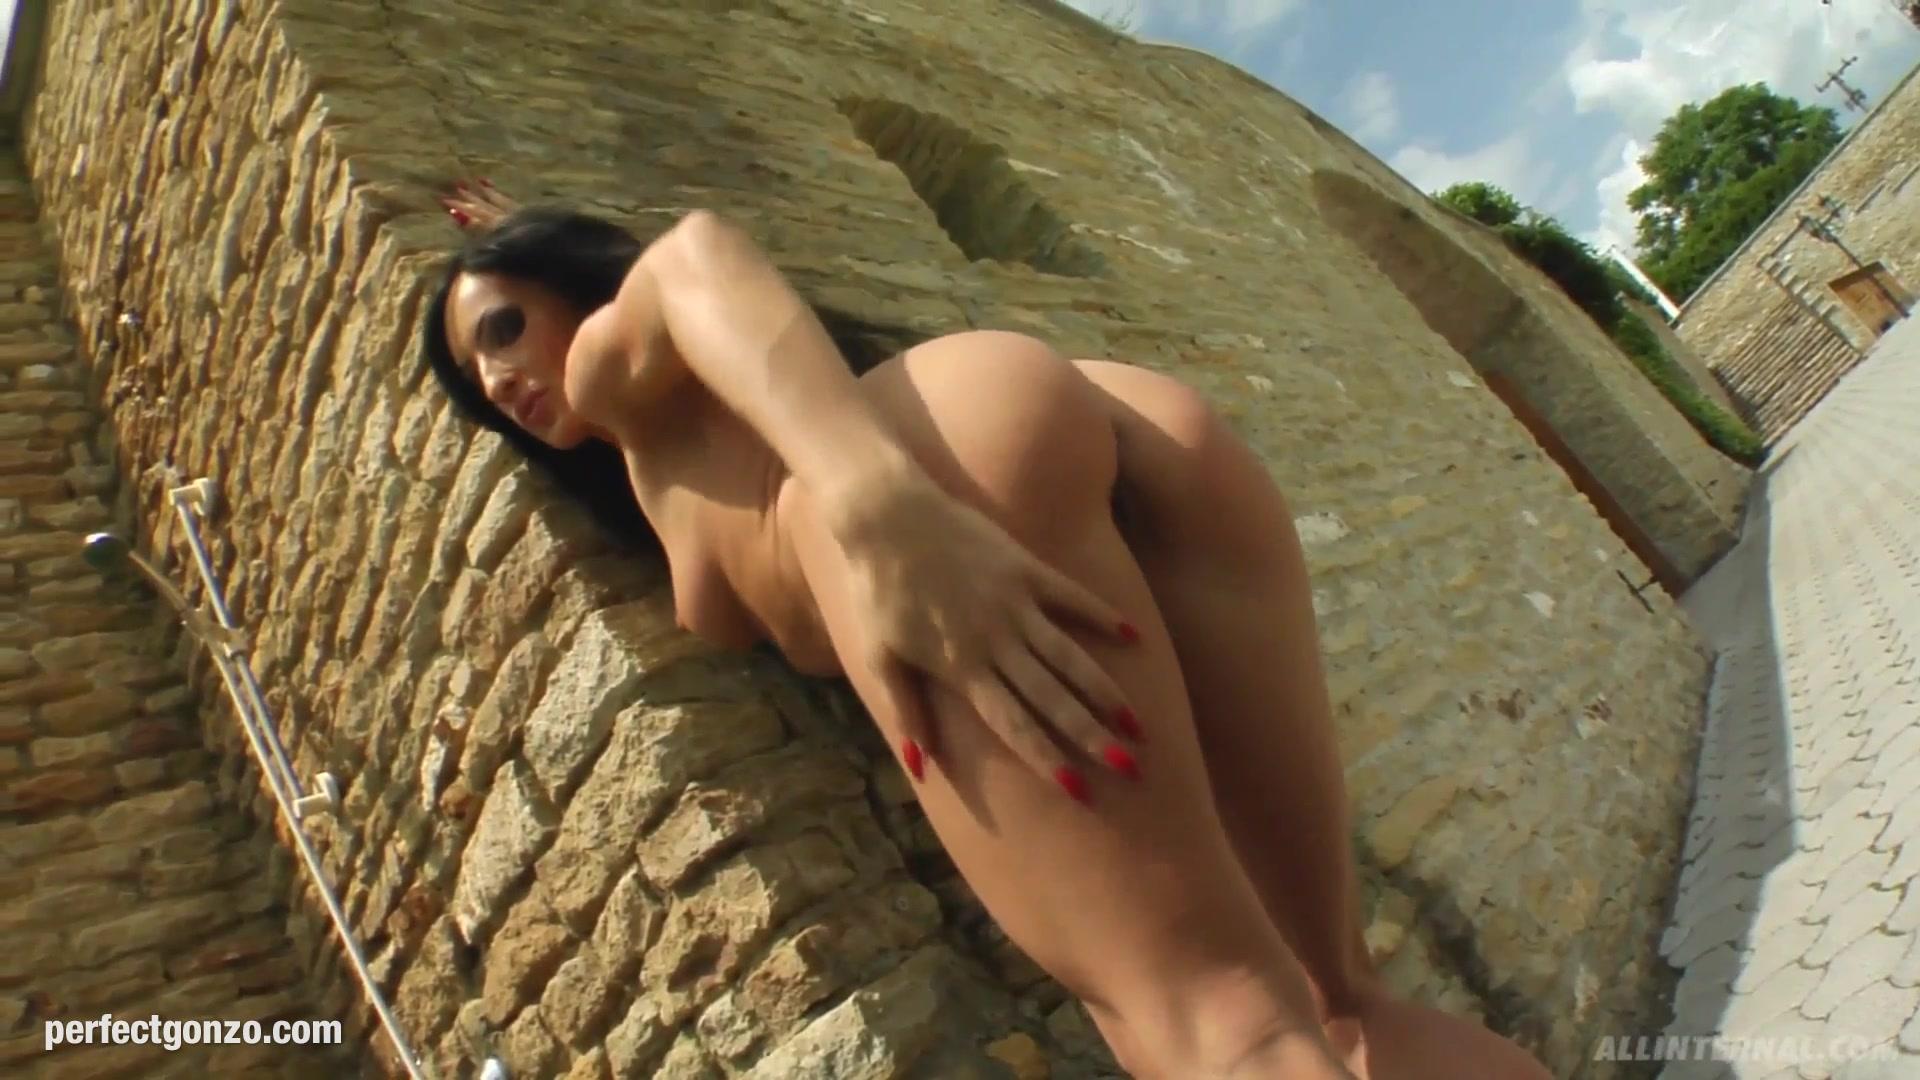 Hot Nude Caught masterbating to porn